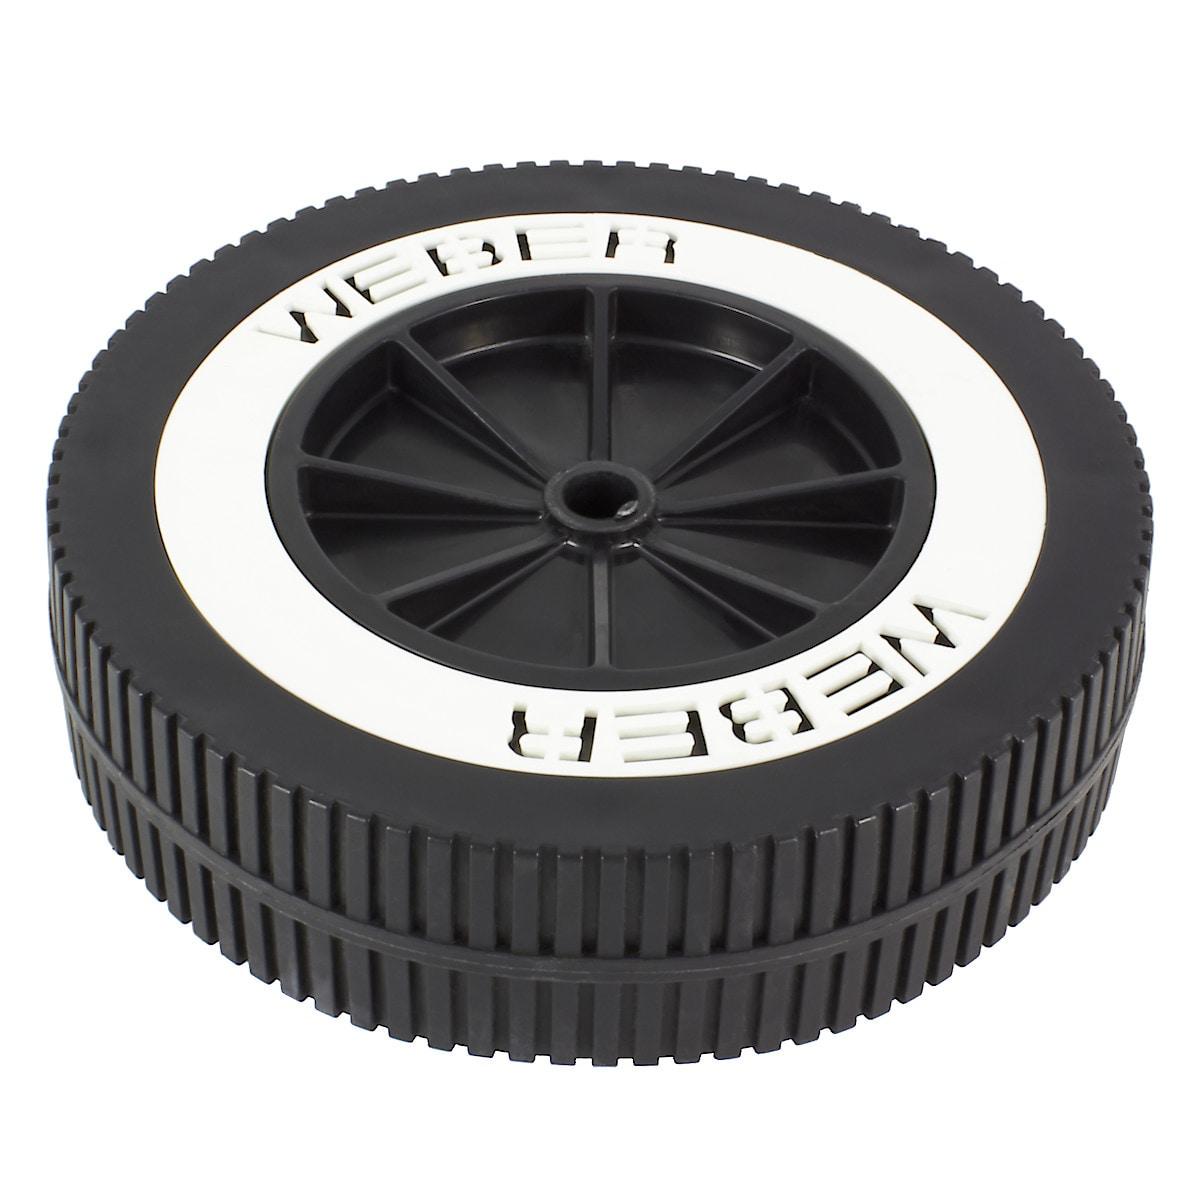 Rad Weber 150 mm